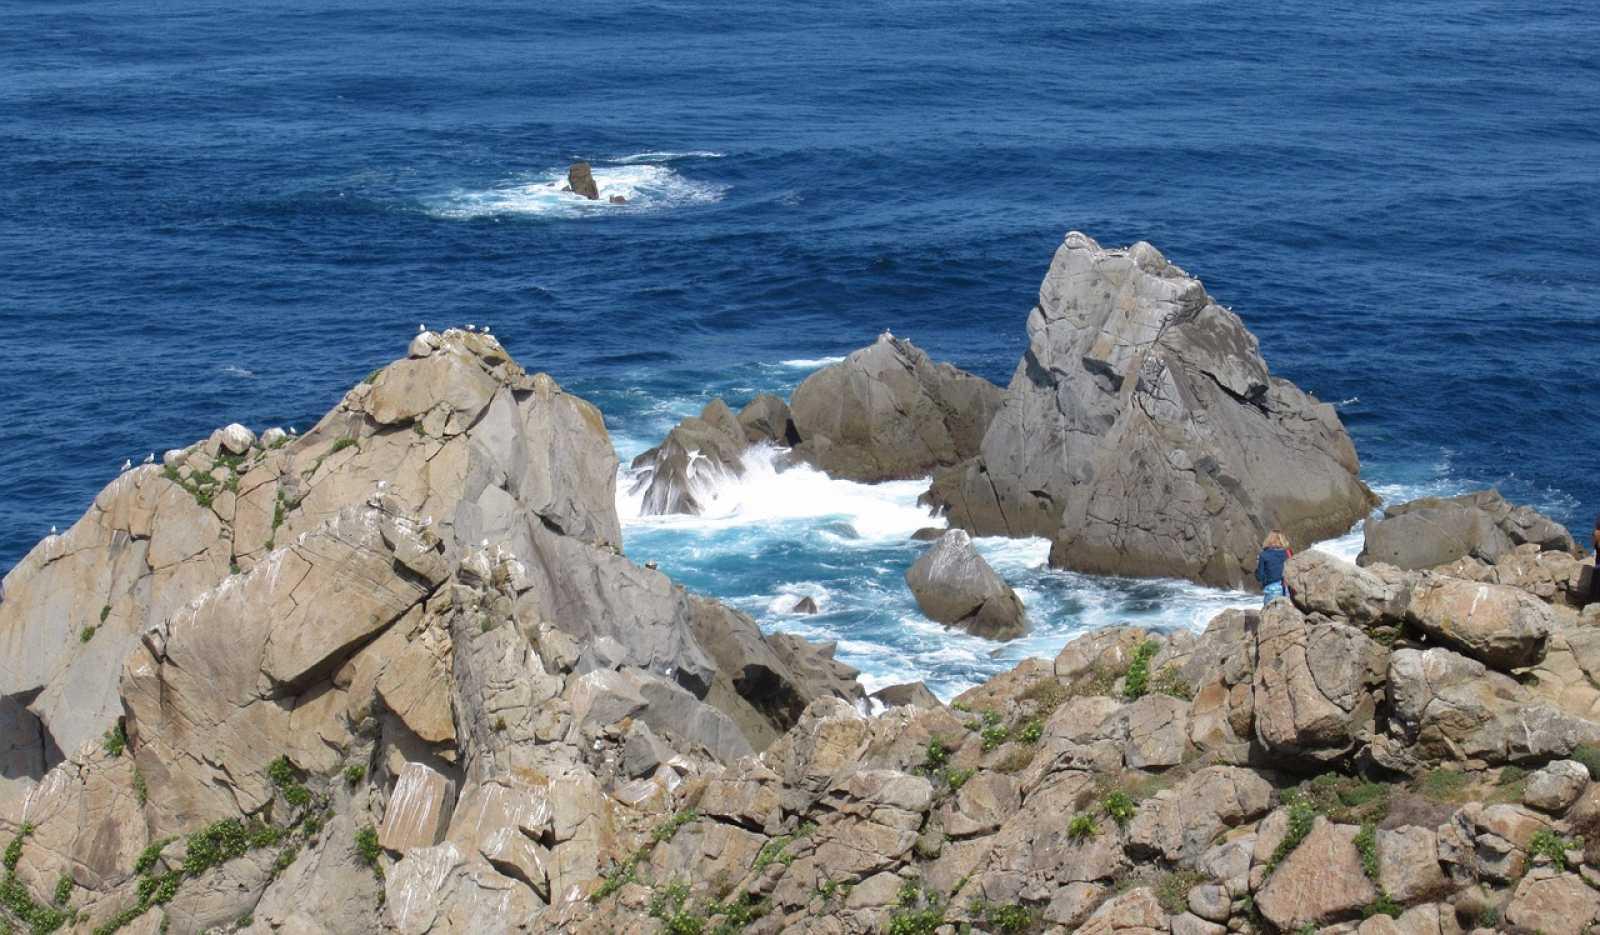 Global 5 - Proyecto Geoparque Cabo Ortegal (III): candidatura UNESCO - 06/10/20 - Escuchar ahora